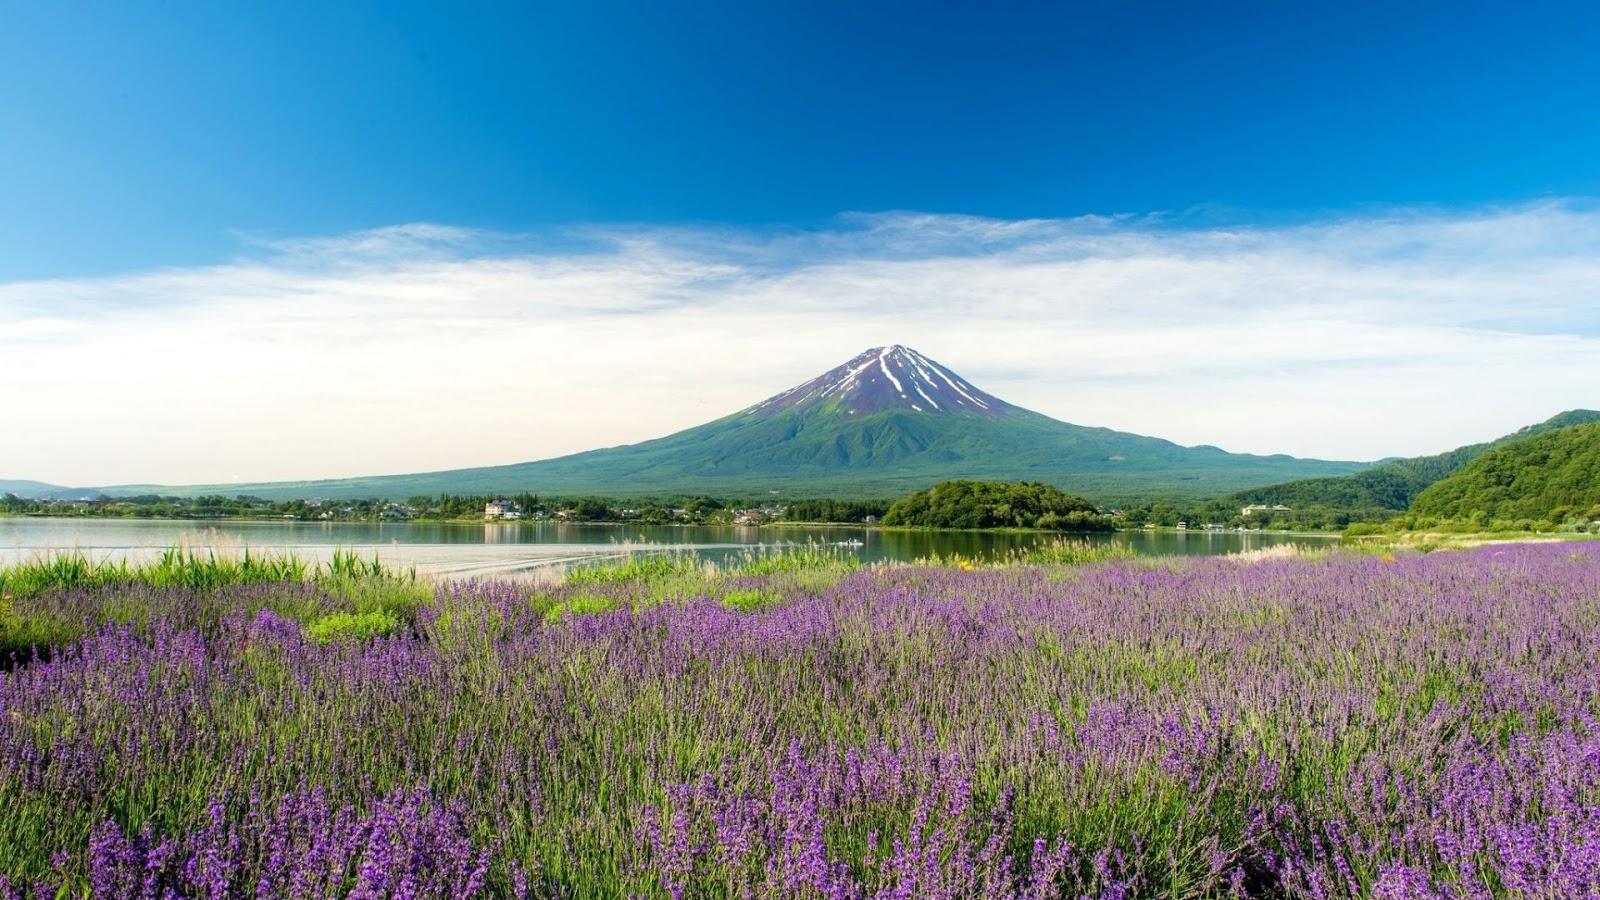 36 Gambar Pemandangan Gunung Yang Bikin Pengen Muncak Gambar